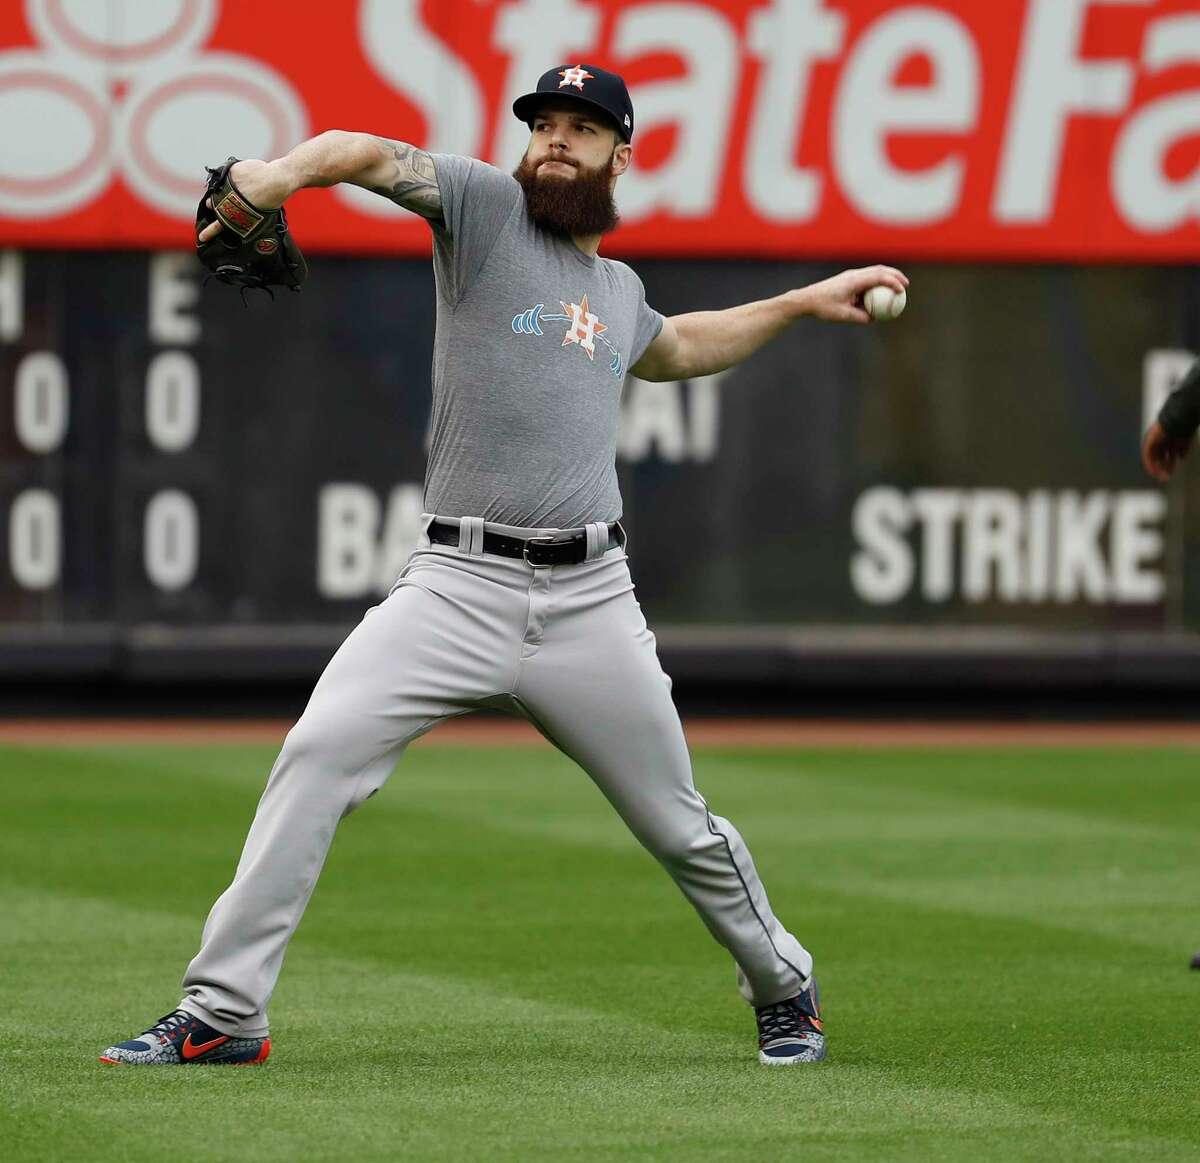 Houston Astros pitcher Dallas Keuchel throws during the Astros workout at Yankee Stadium, Sunday Oct. 15, 2017, in Houston.